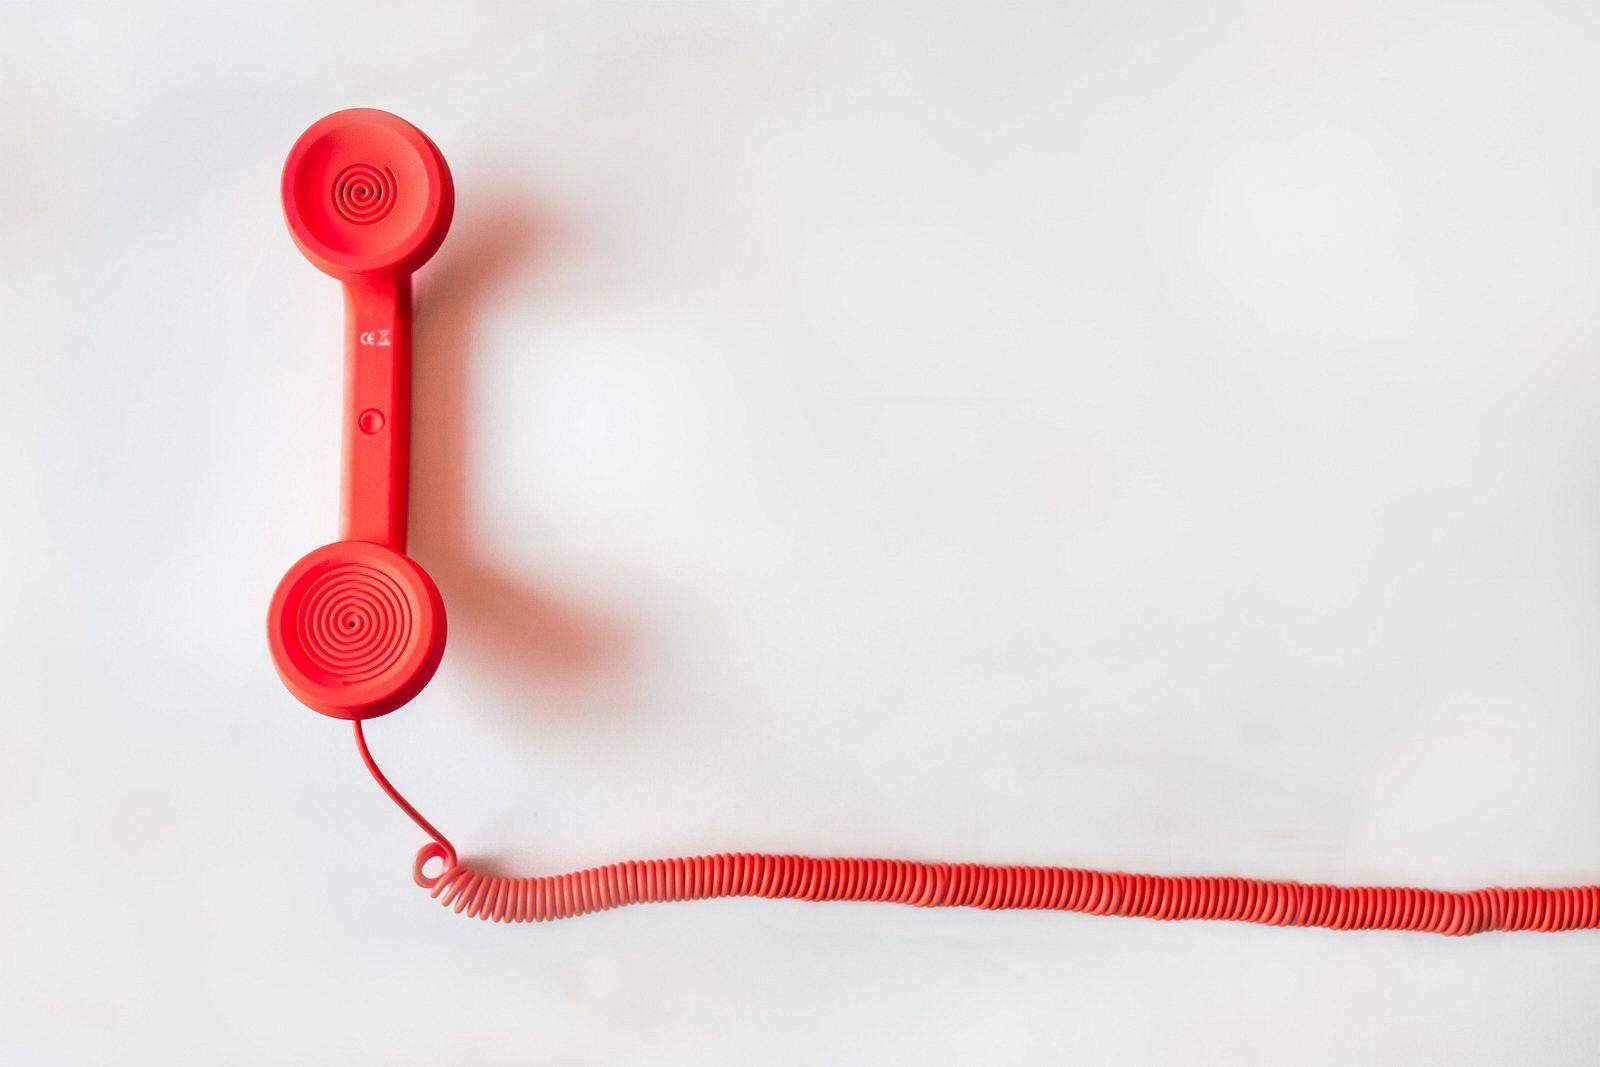 Povezani preko telefona